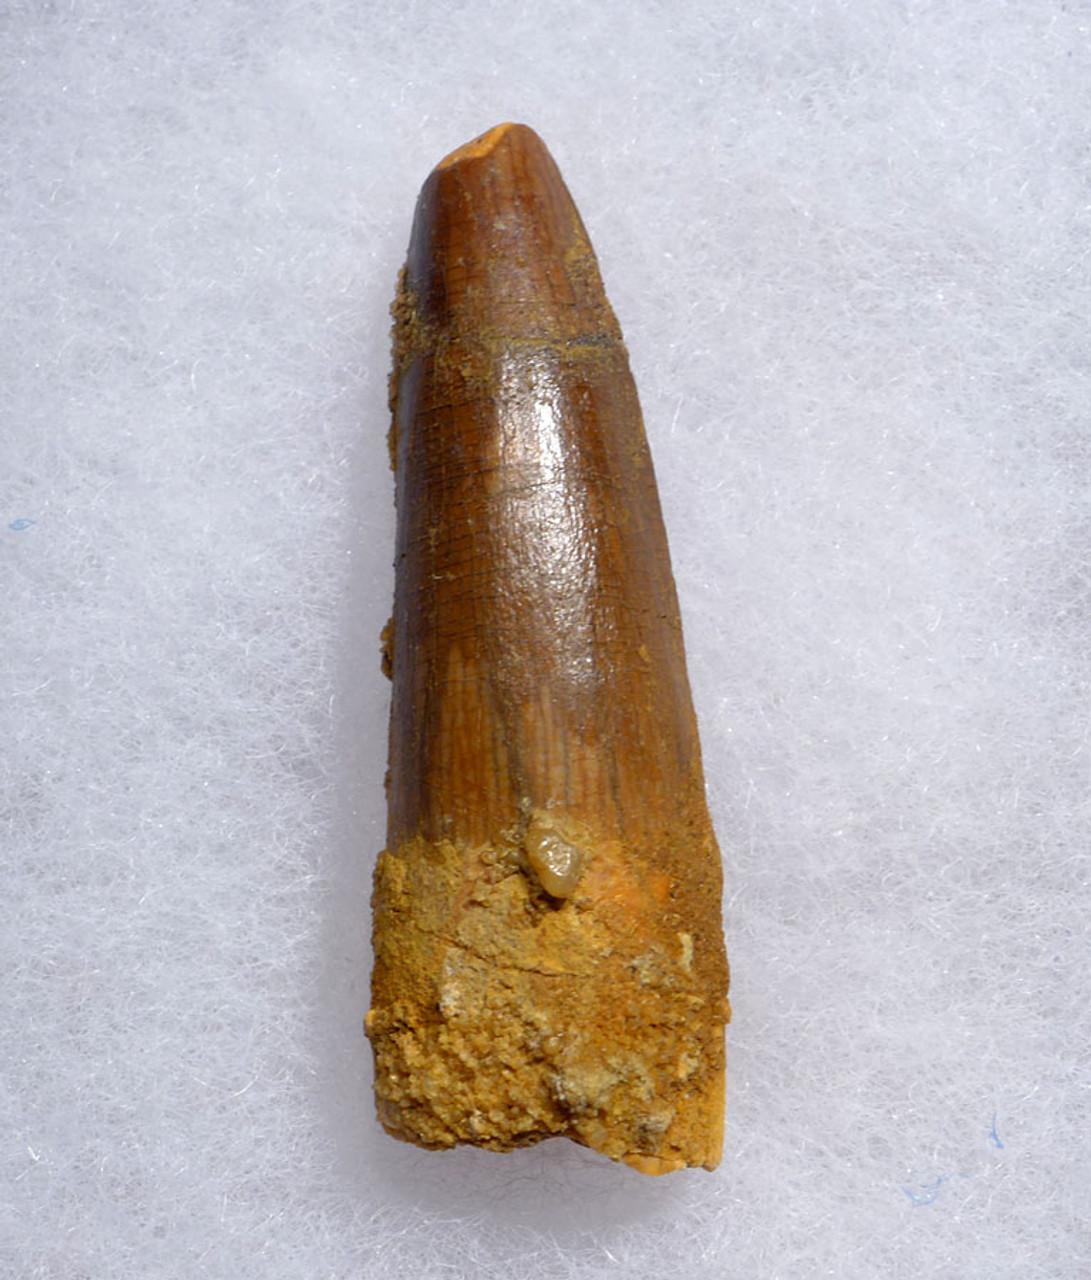 GOLD ORANGE 1.9 INCH SPINOSAURUS DINOSAUR FOSSIL TOOTH *DT5-469